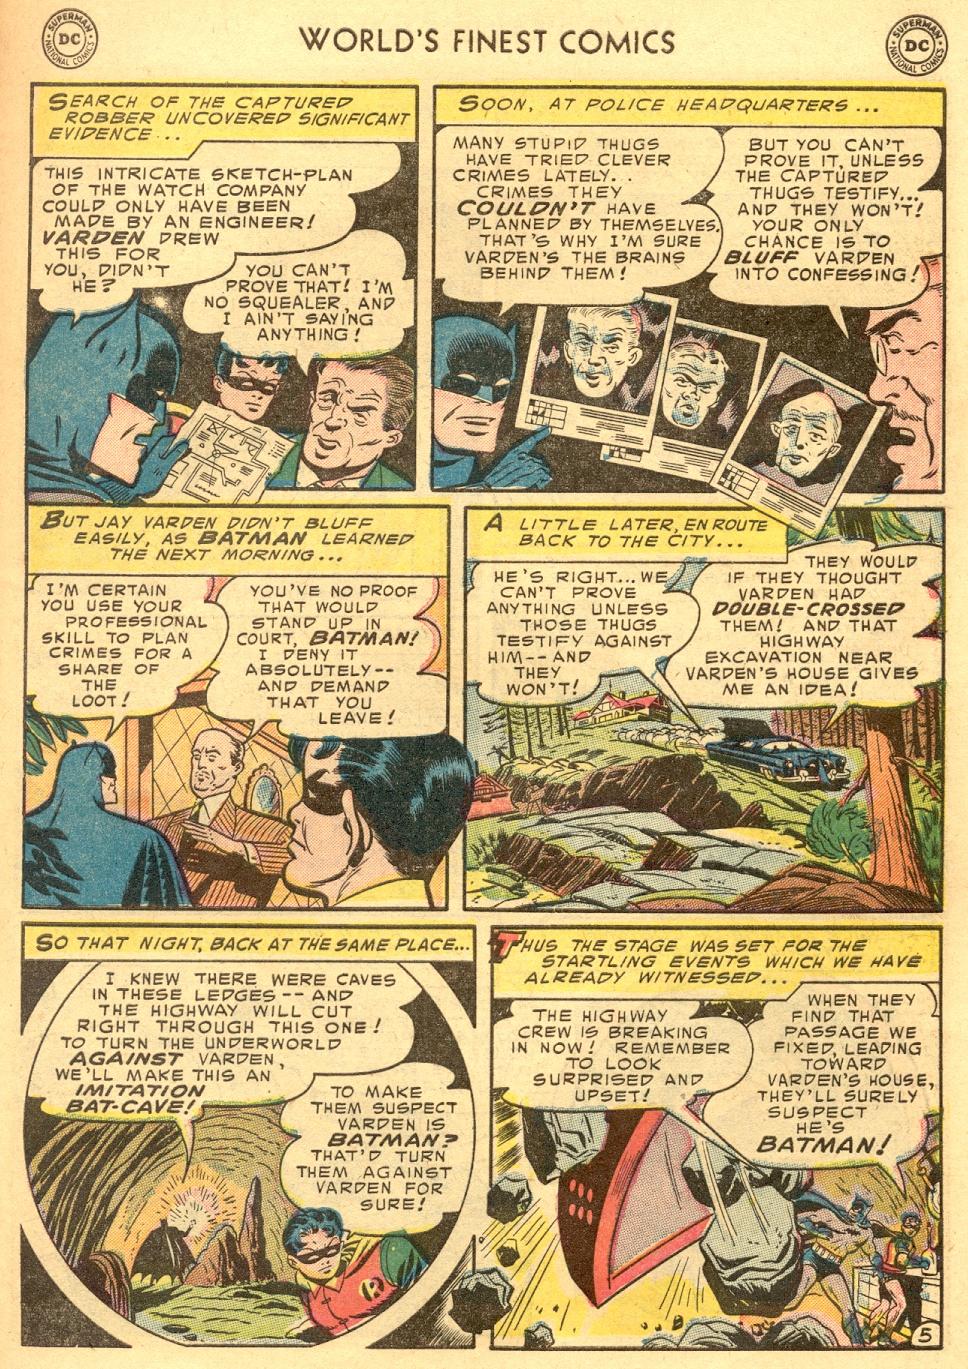 Read online World's Finest Comics comic -  Issue #70 - 59